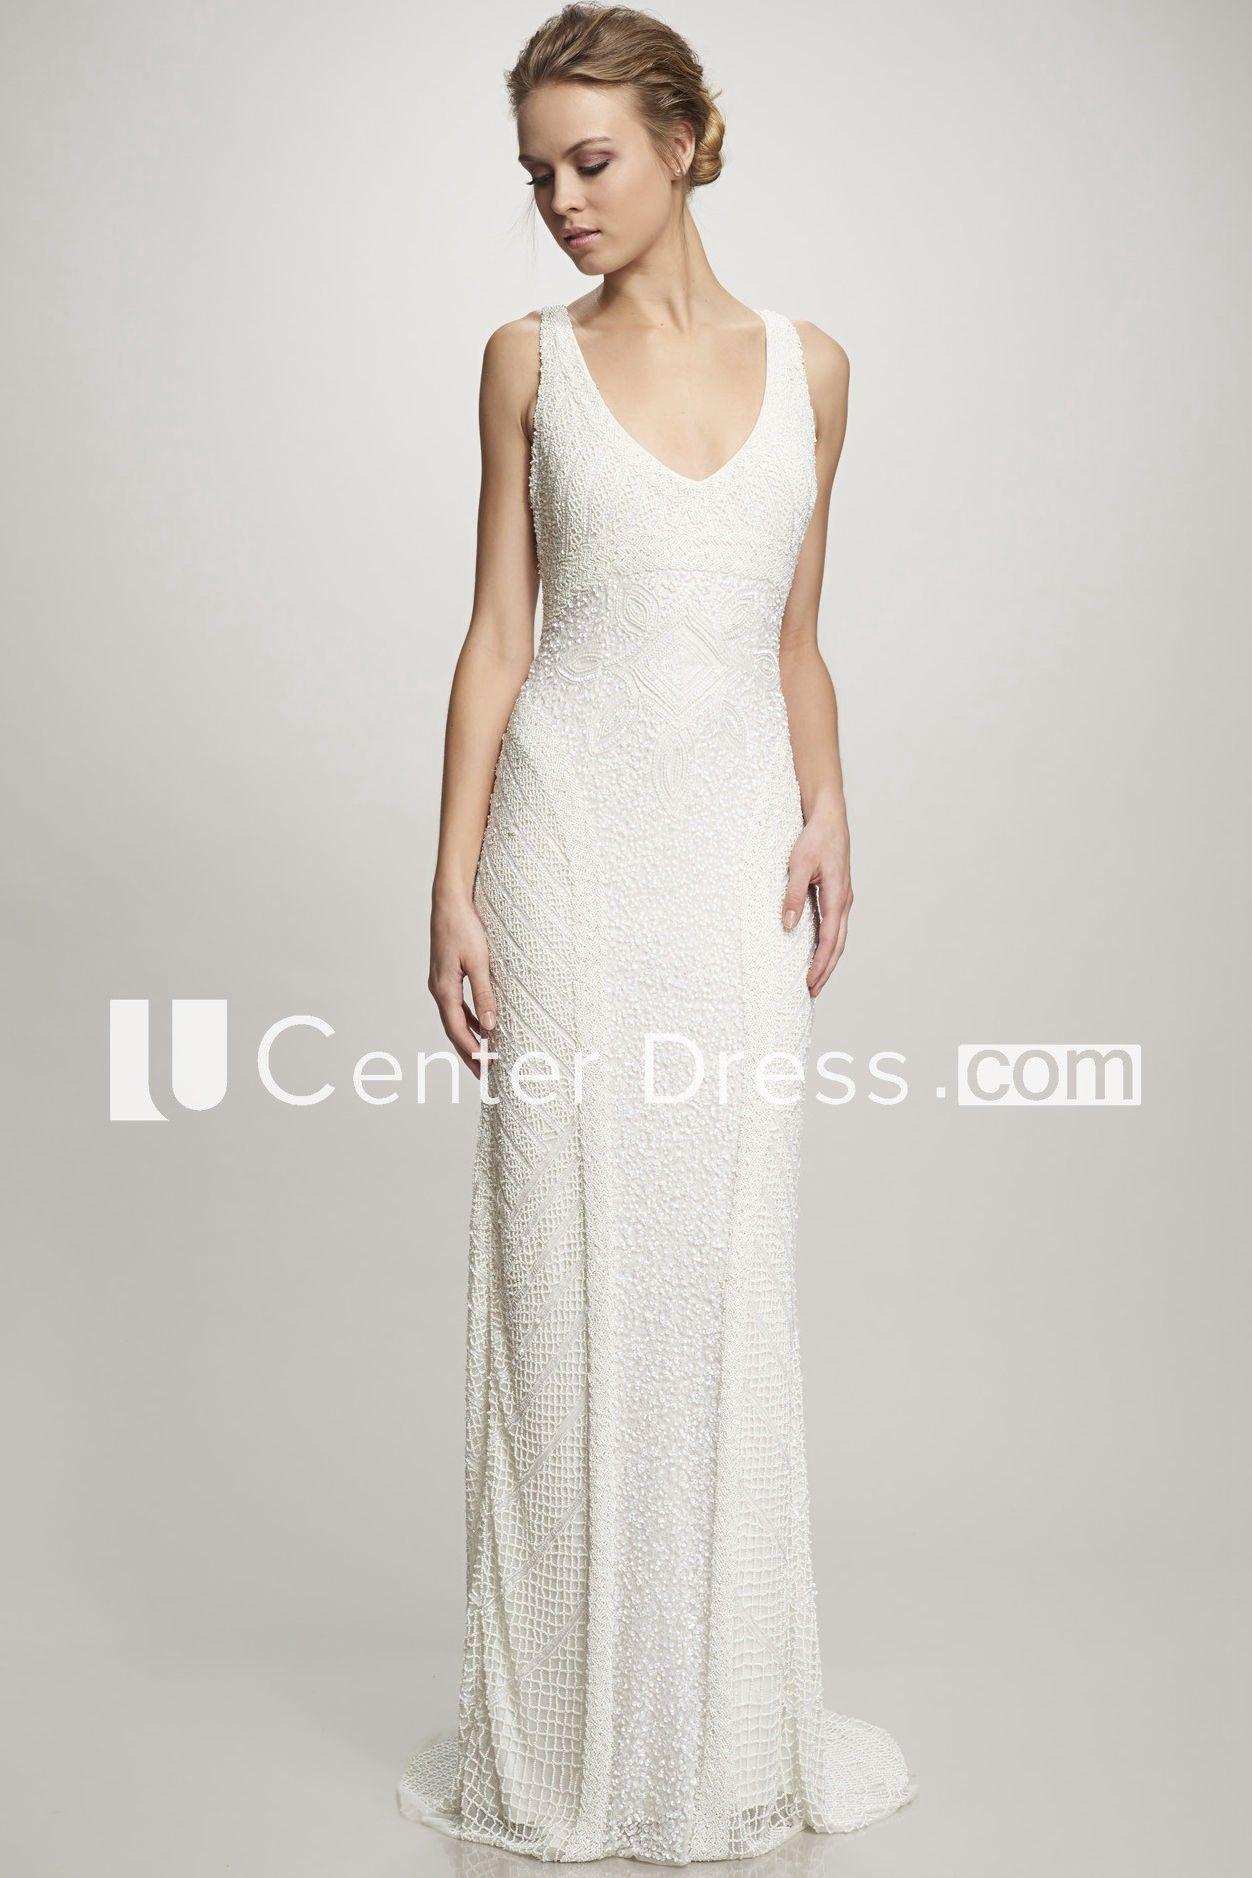 Long vneck wedding dress with sweep train and v back wedding